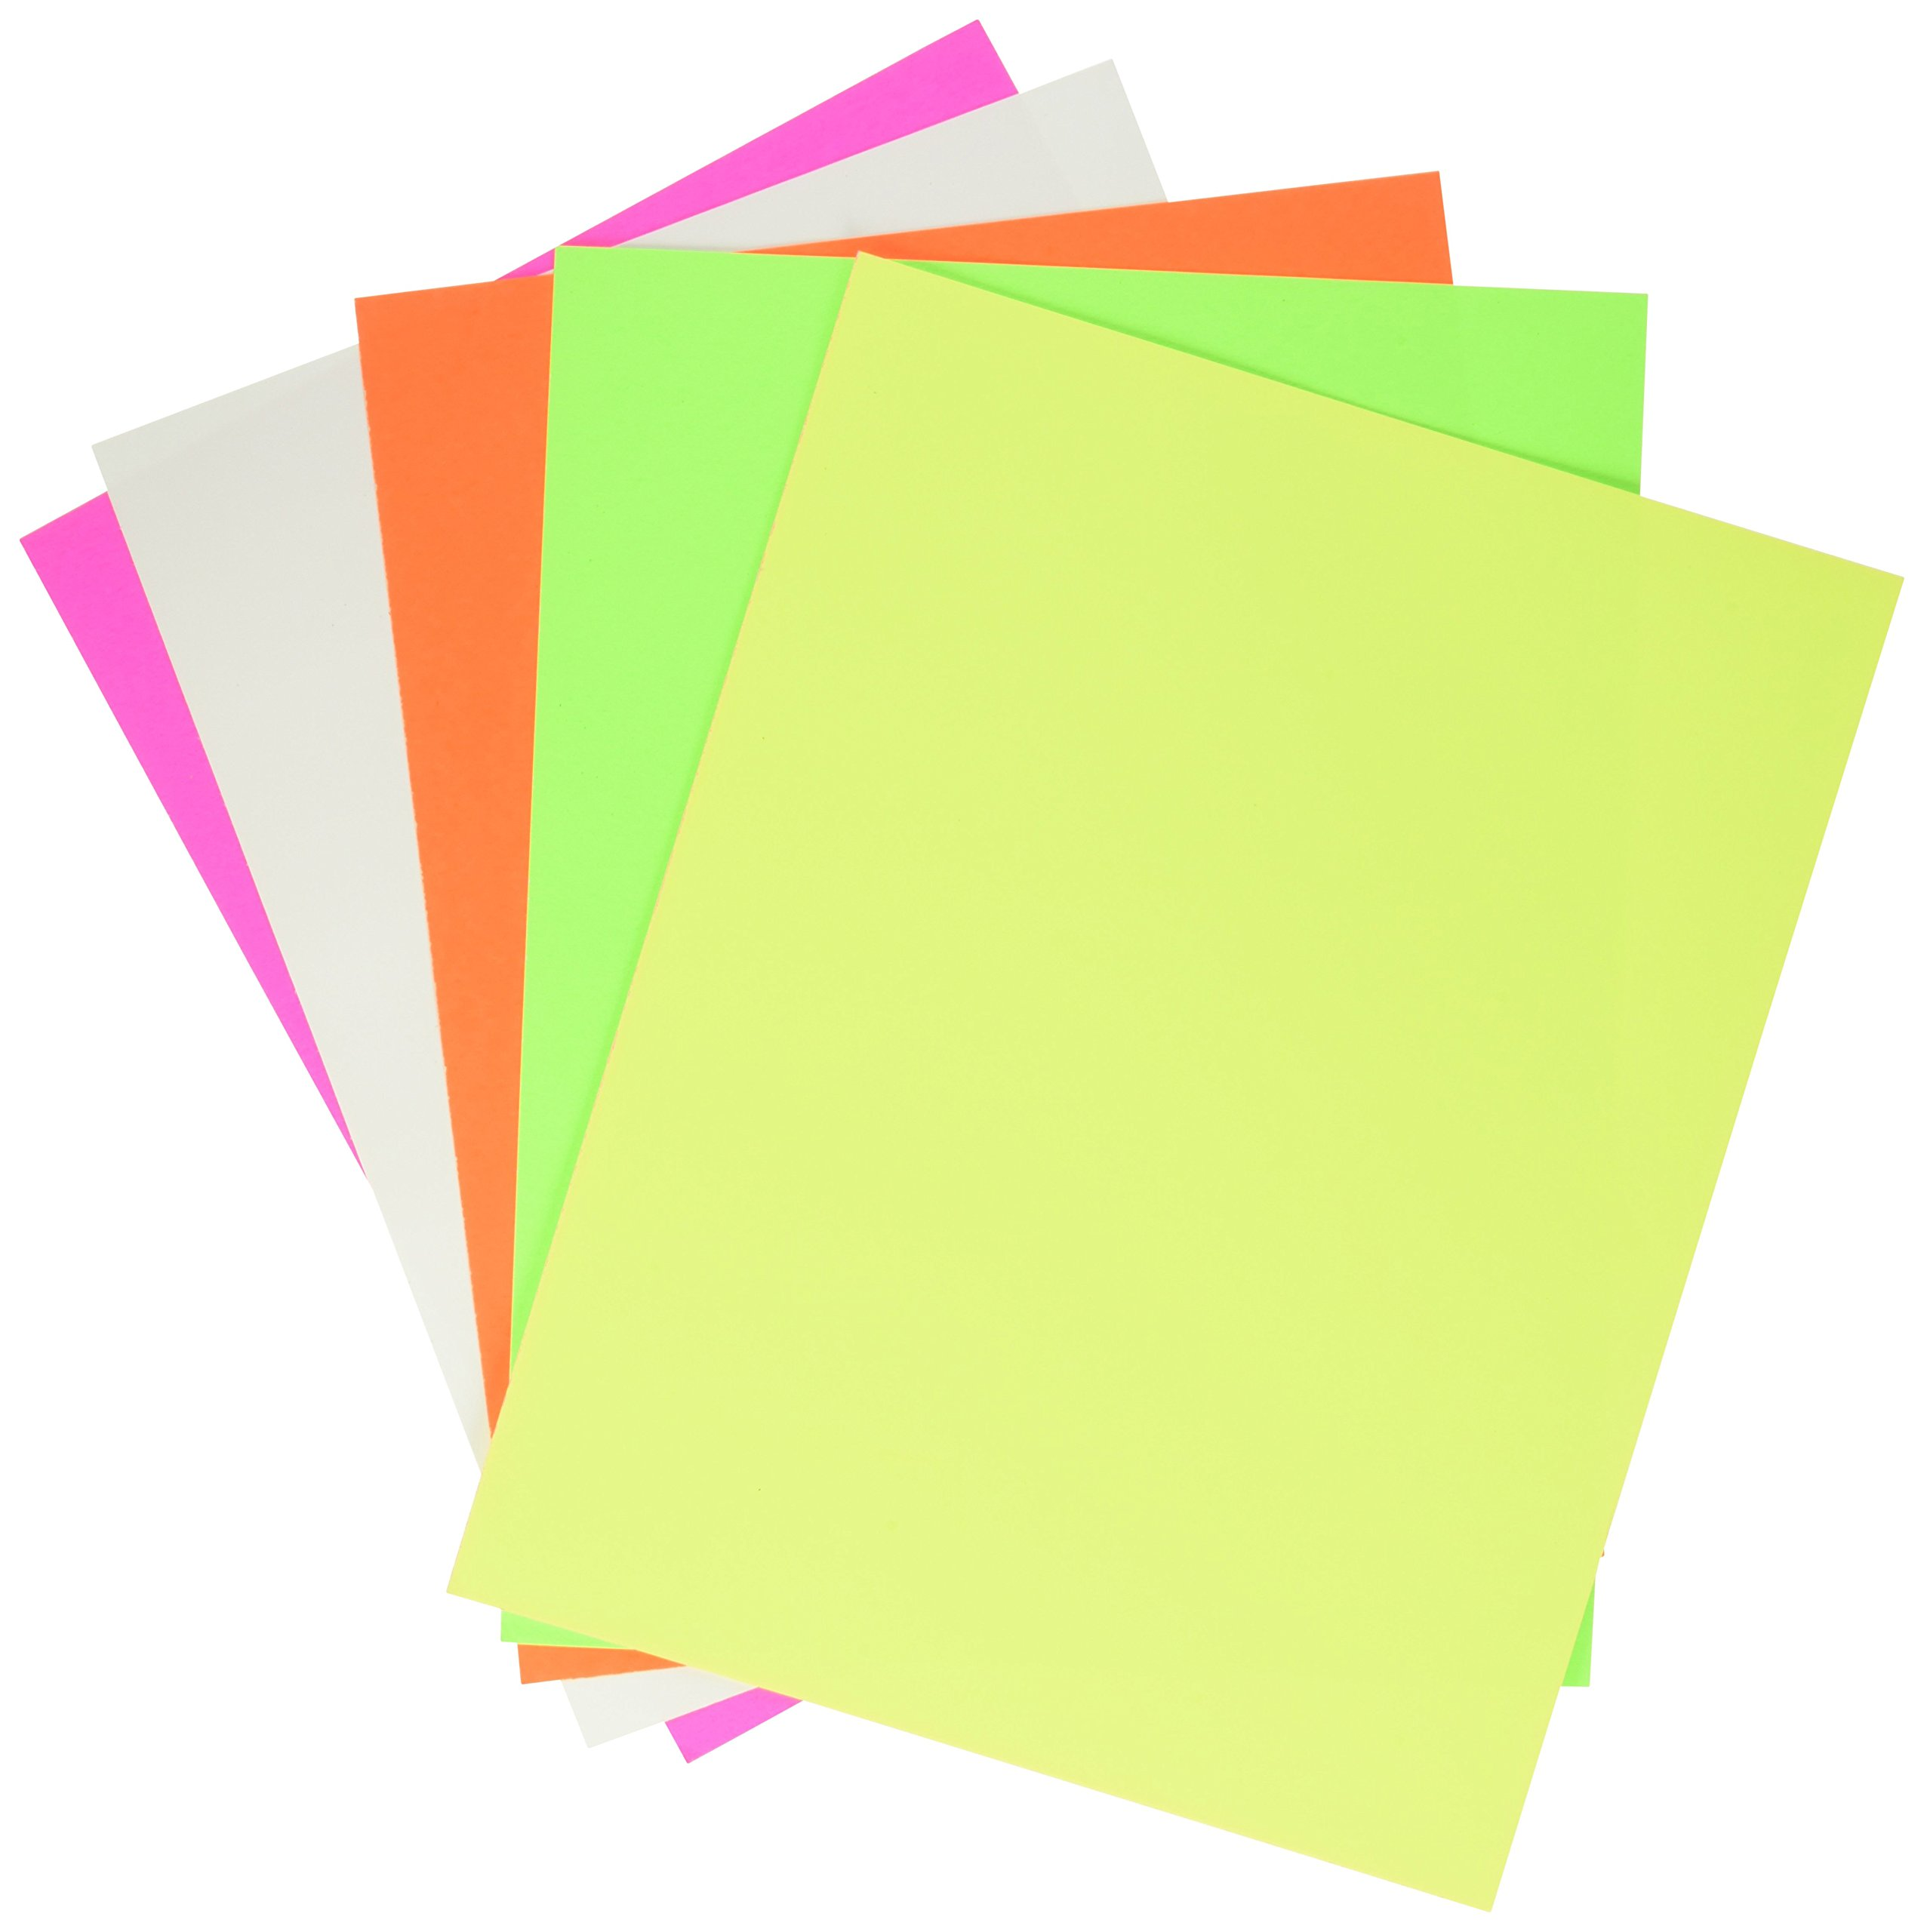 School Smart 1371700 Poster Board - 11 x 14 - Pack of 50 - Assorted Neon Colors